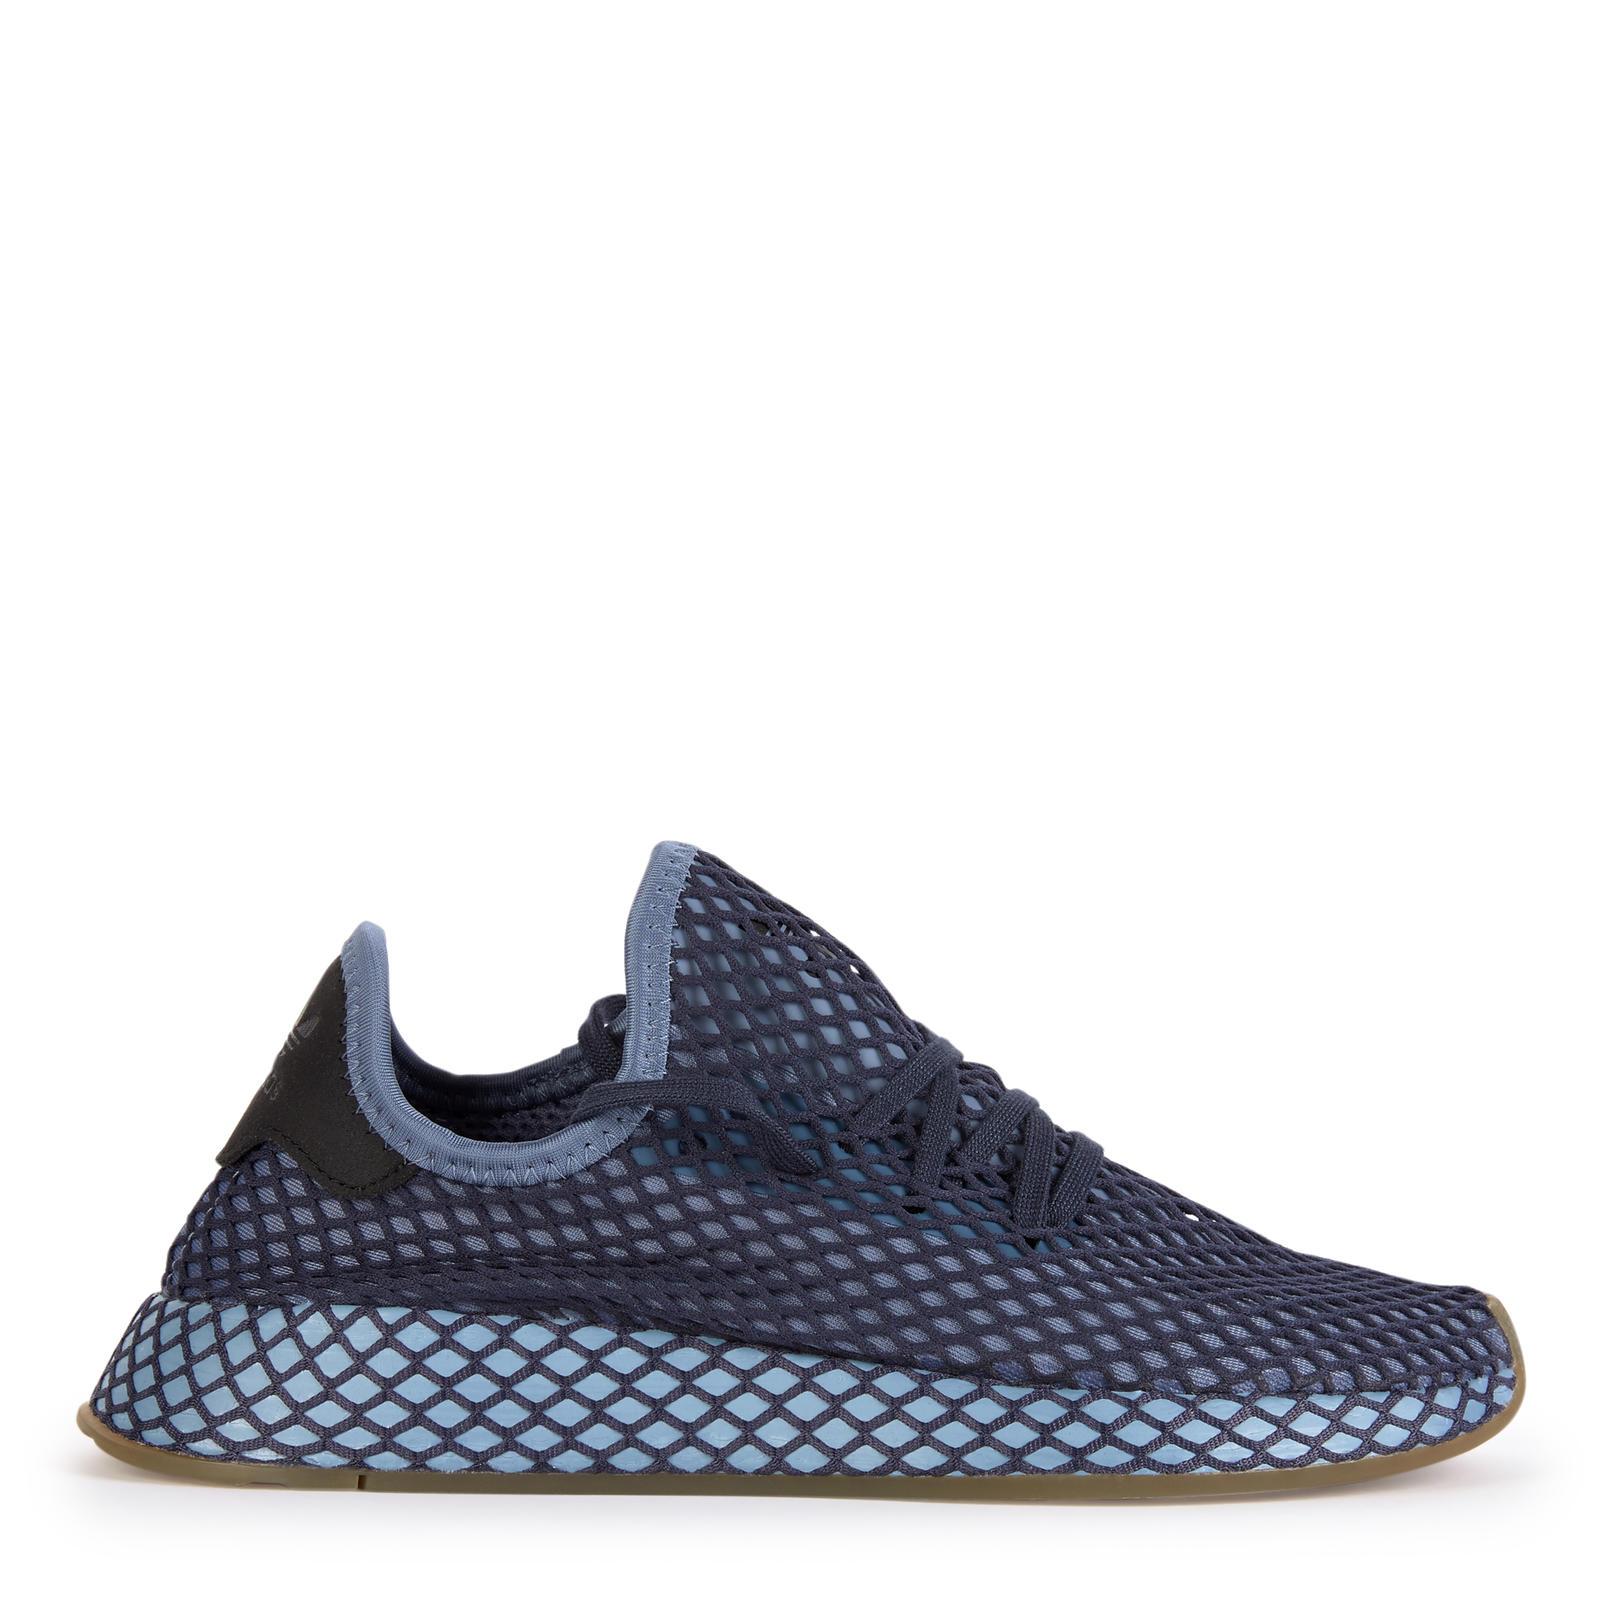 Baskets Adidas Original Deerupt Runner Blue (Taille 37 1/3)